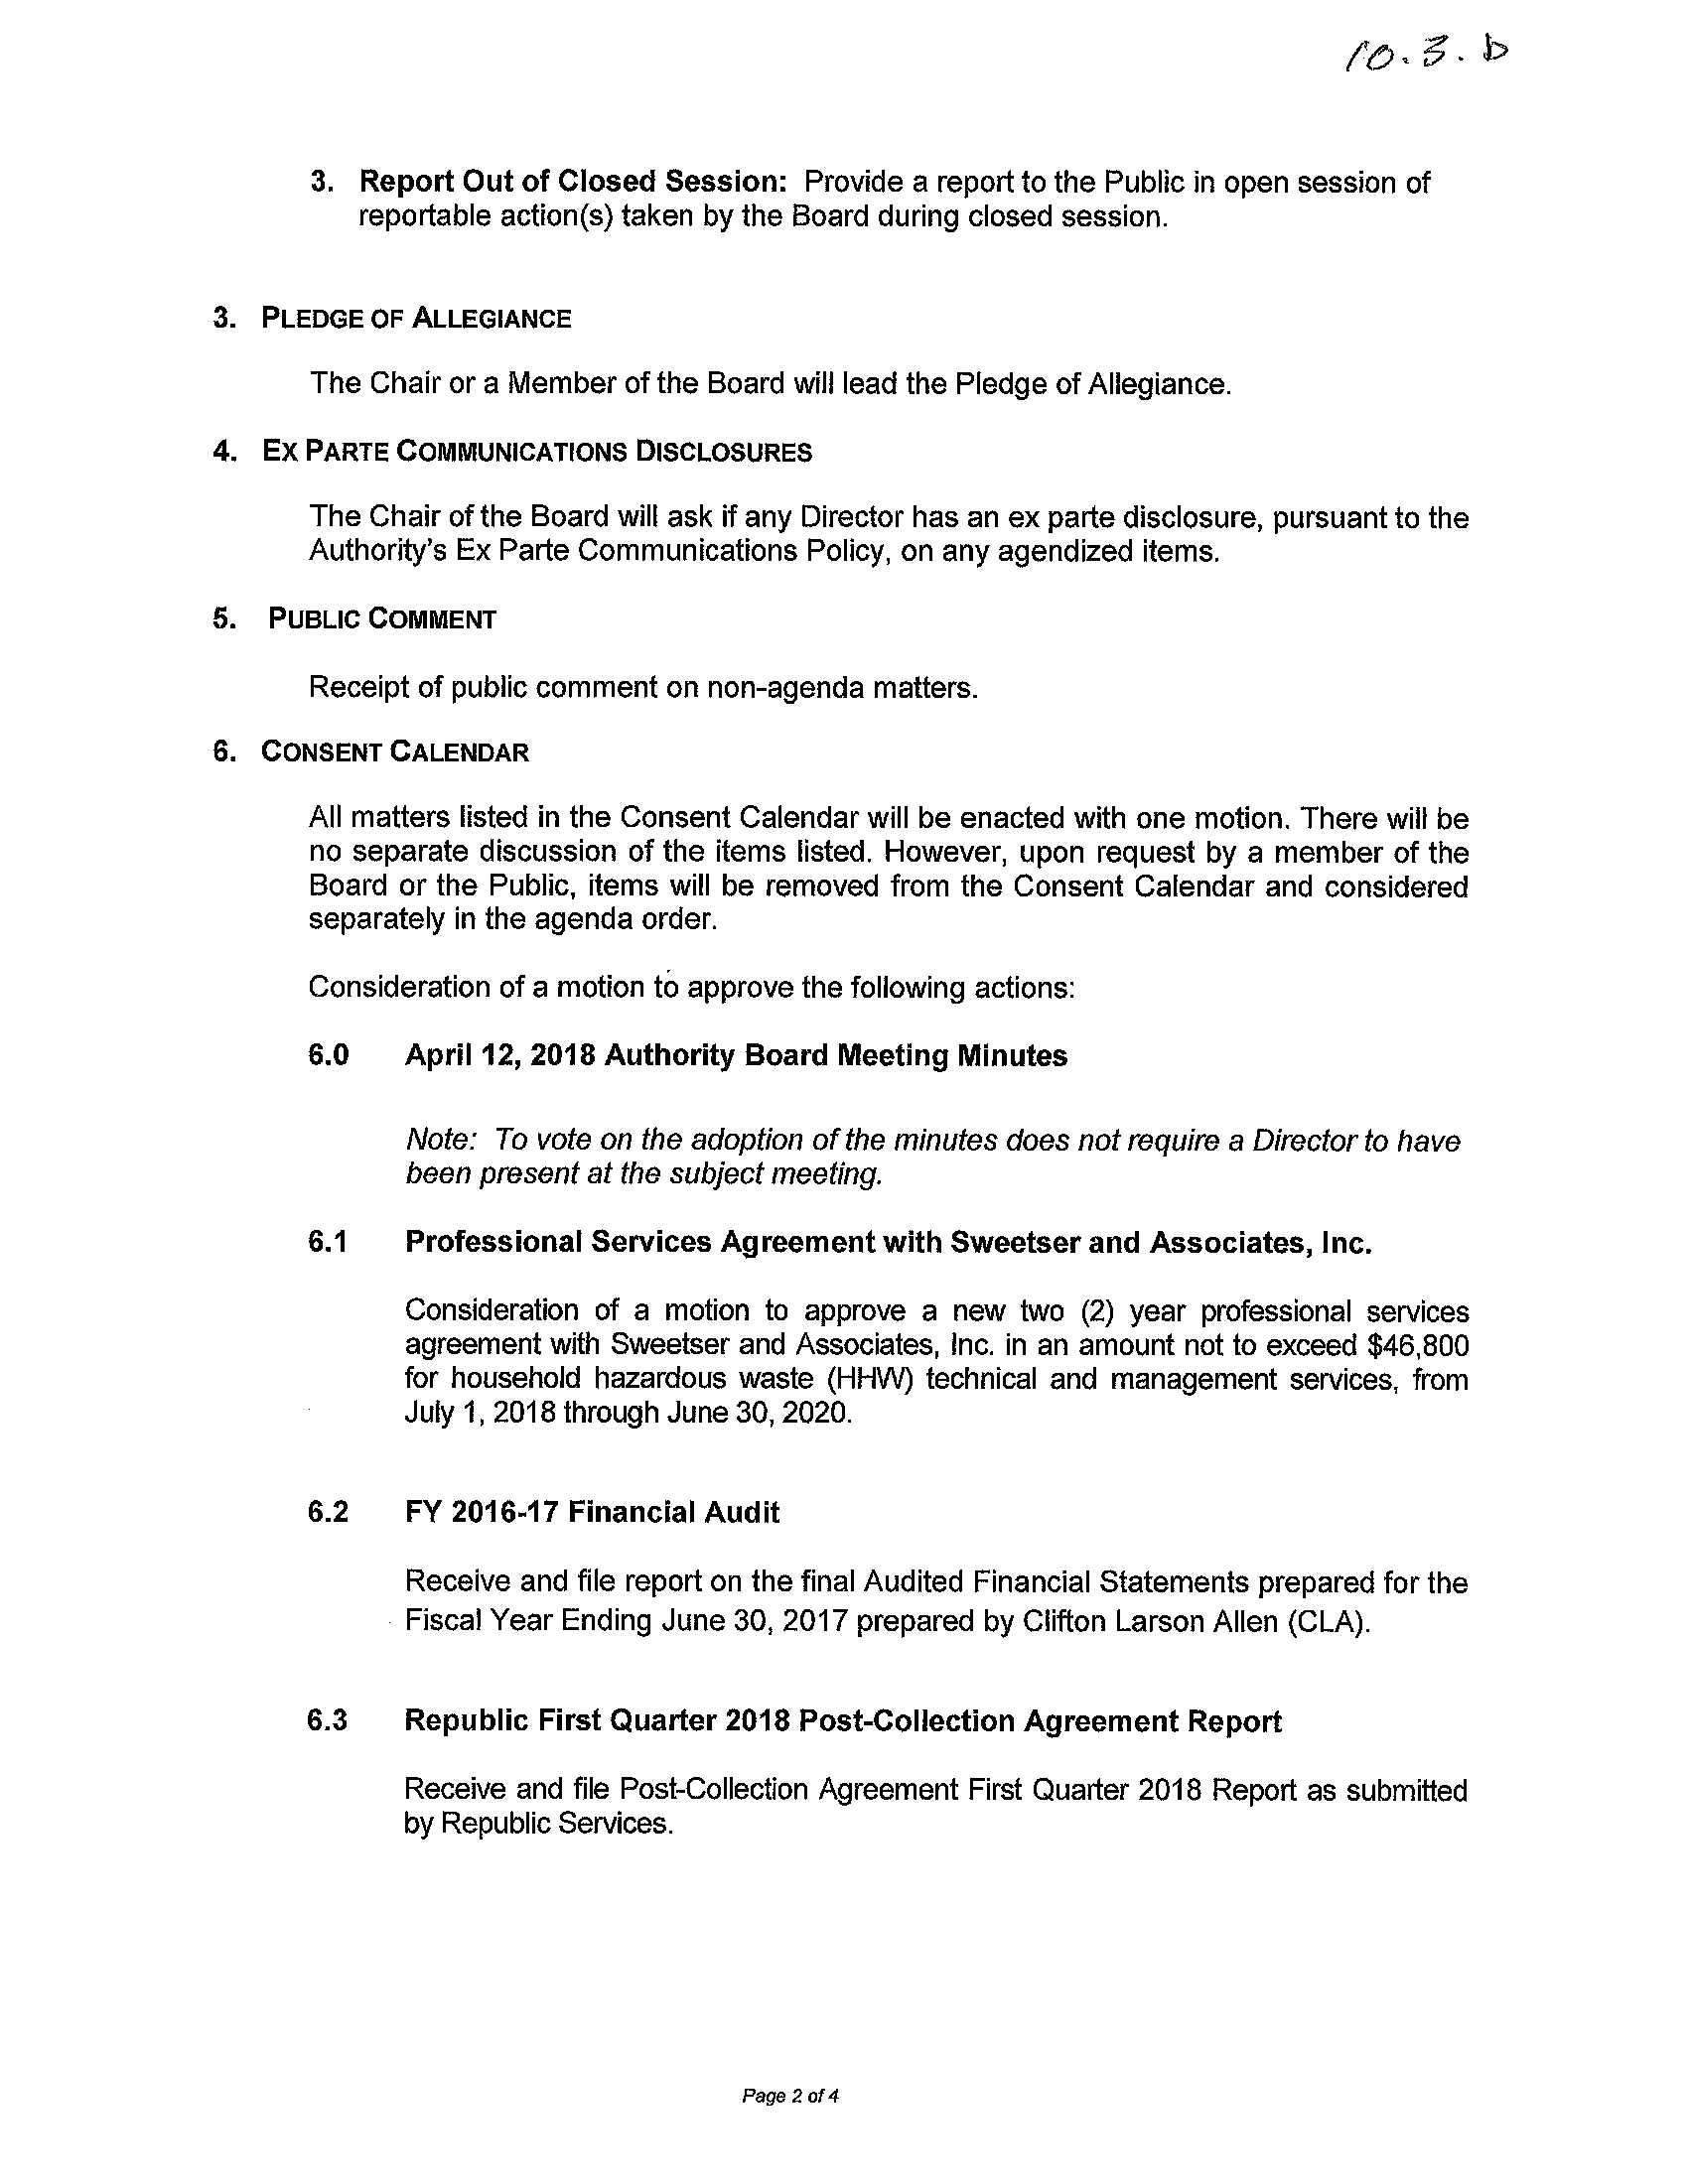 ESMAC Agenda 7.11.2018 (36 Pages)_19.jpg